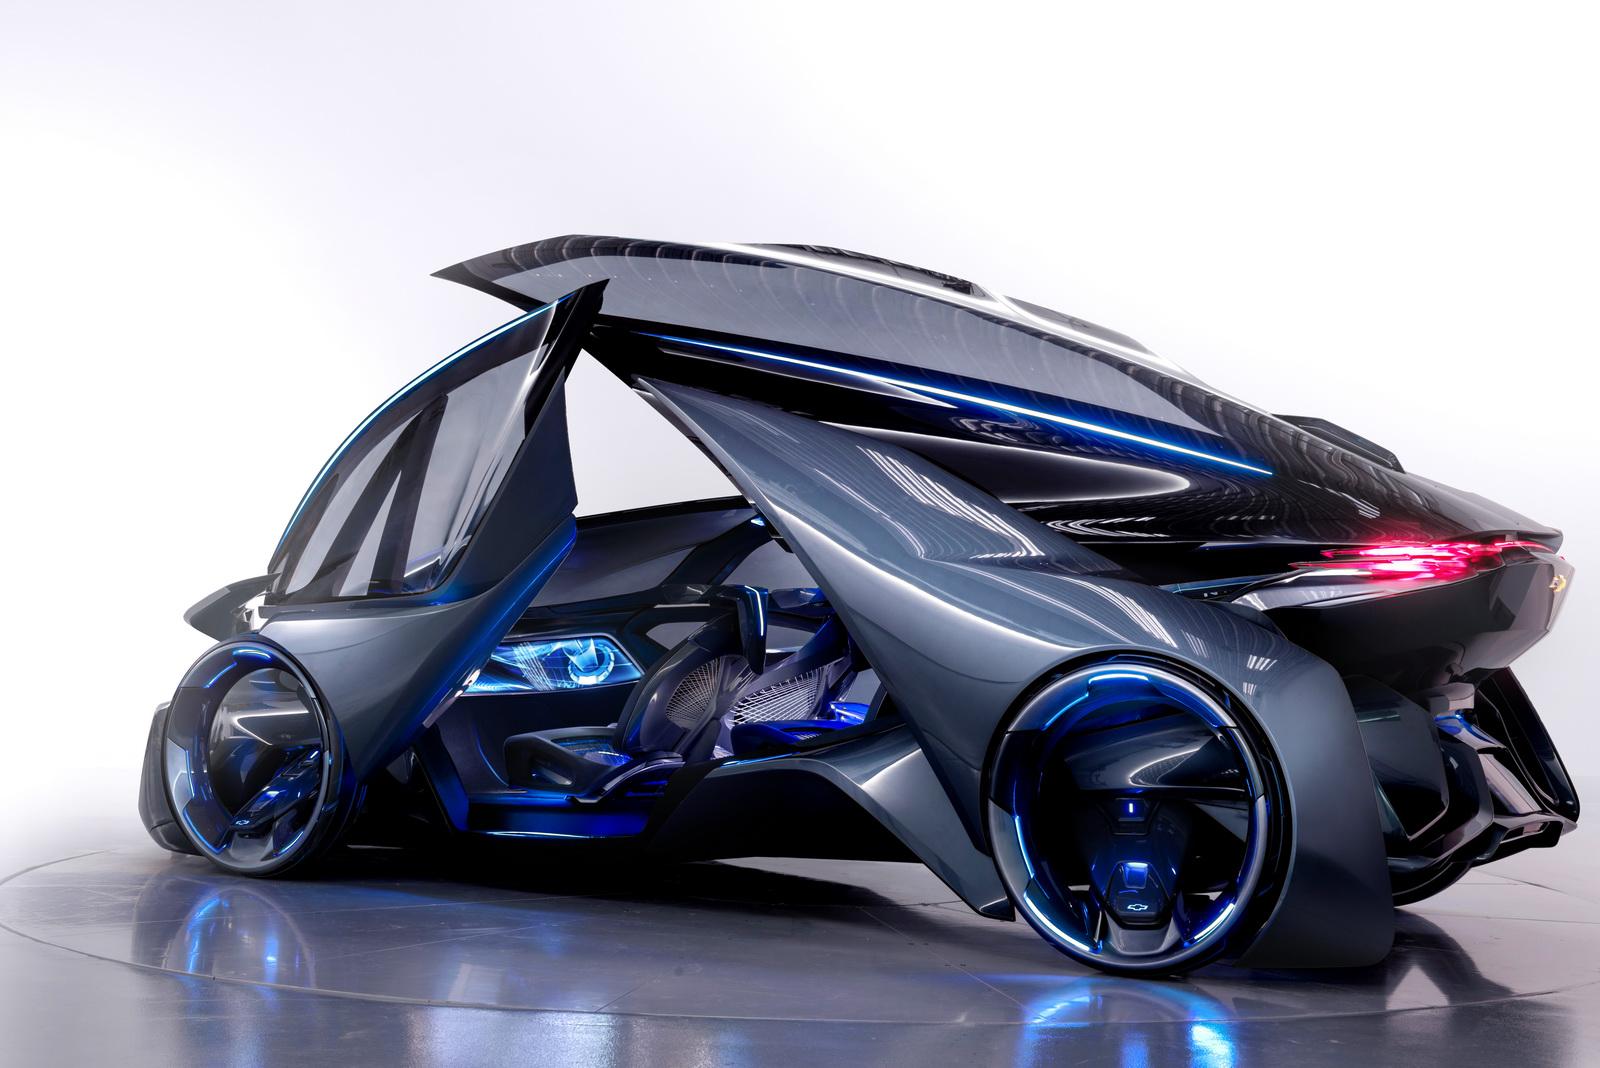 Chevy Concept Cars 2015 2015 Chevrolet FNR - �...